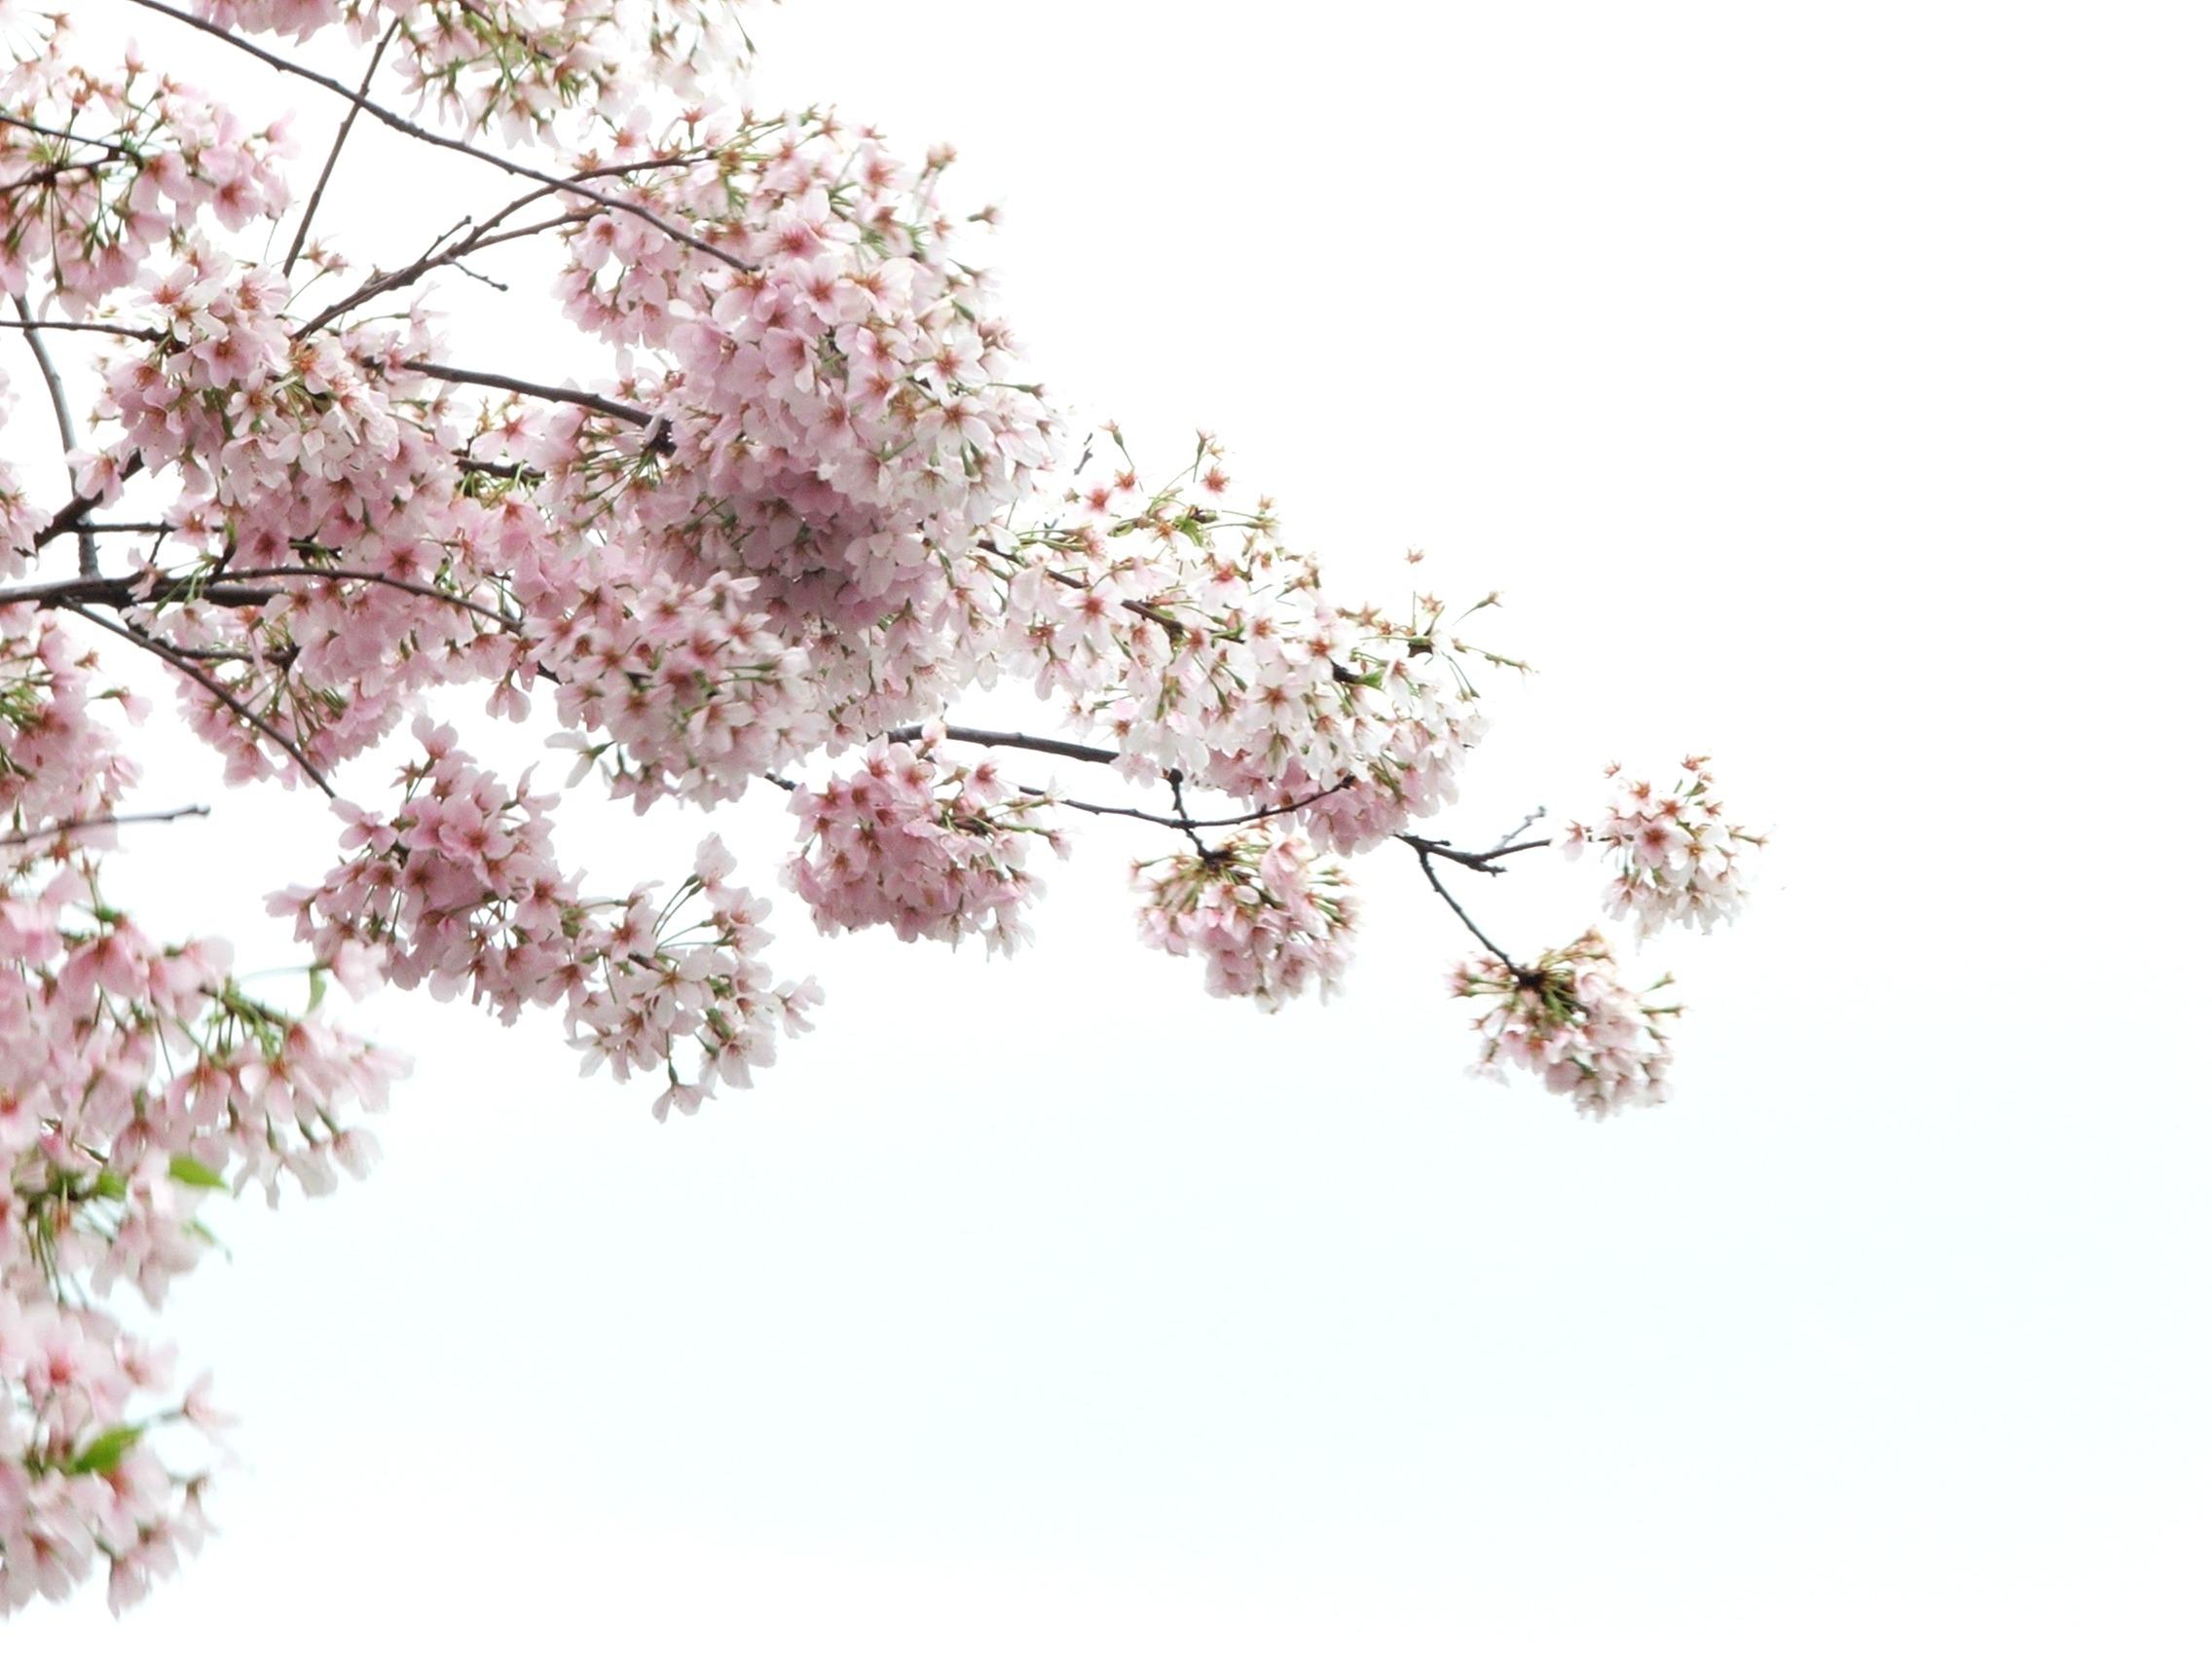 cherry blossom branch - photo #49